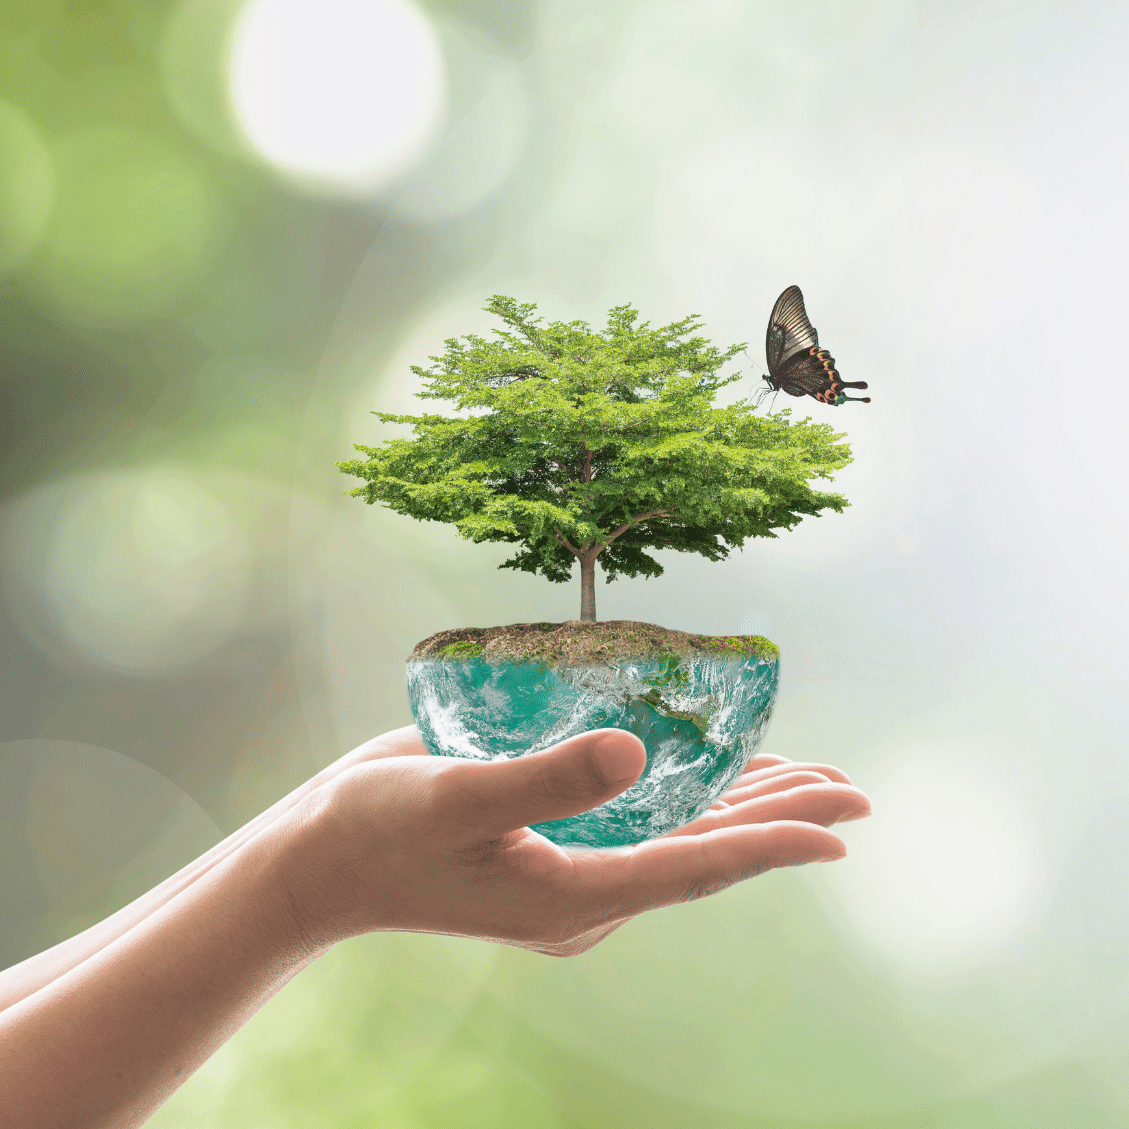 Teraganix environmentally-friendly Organko